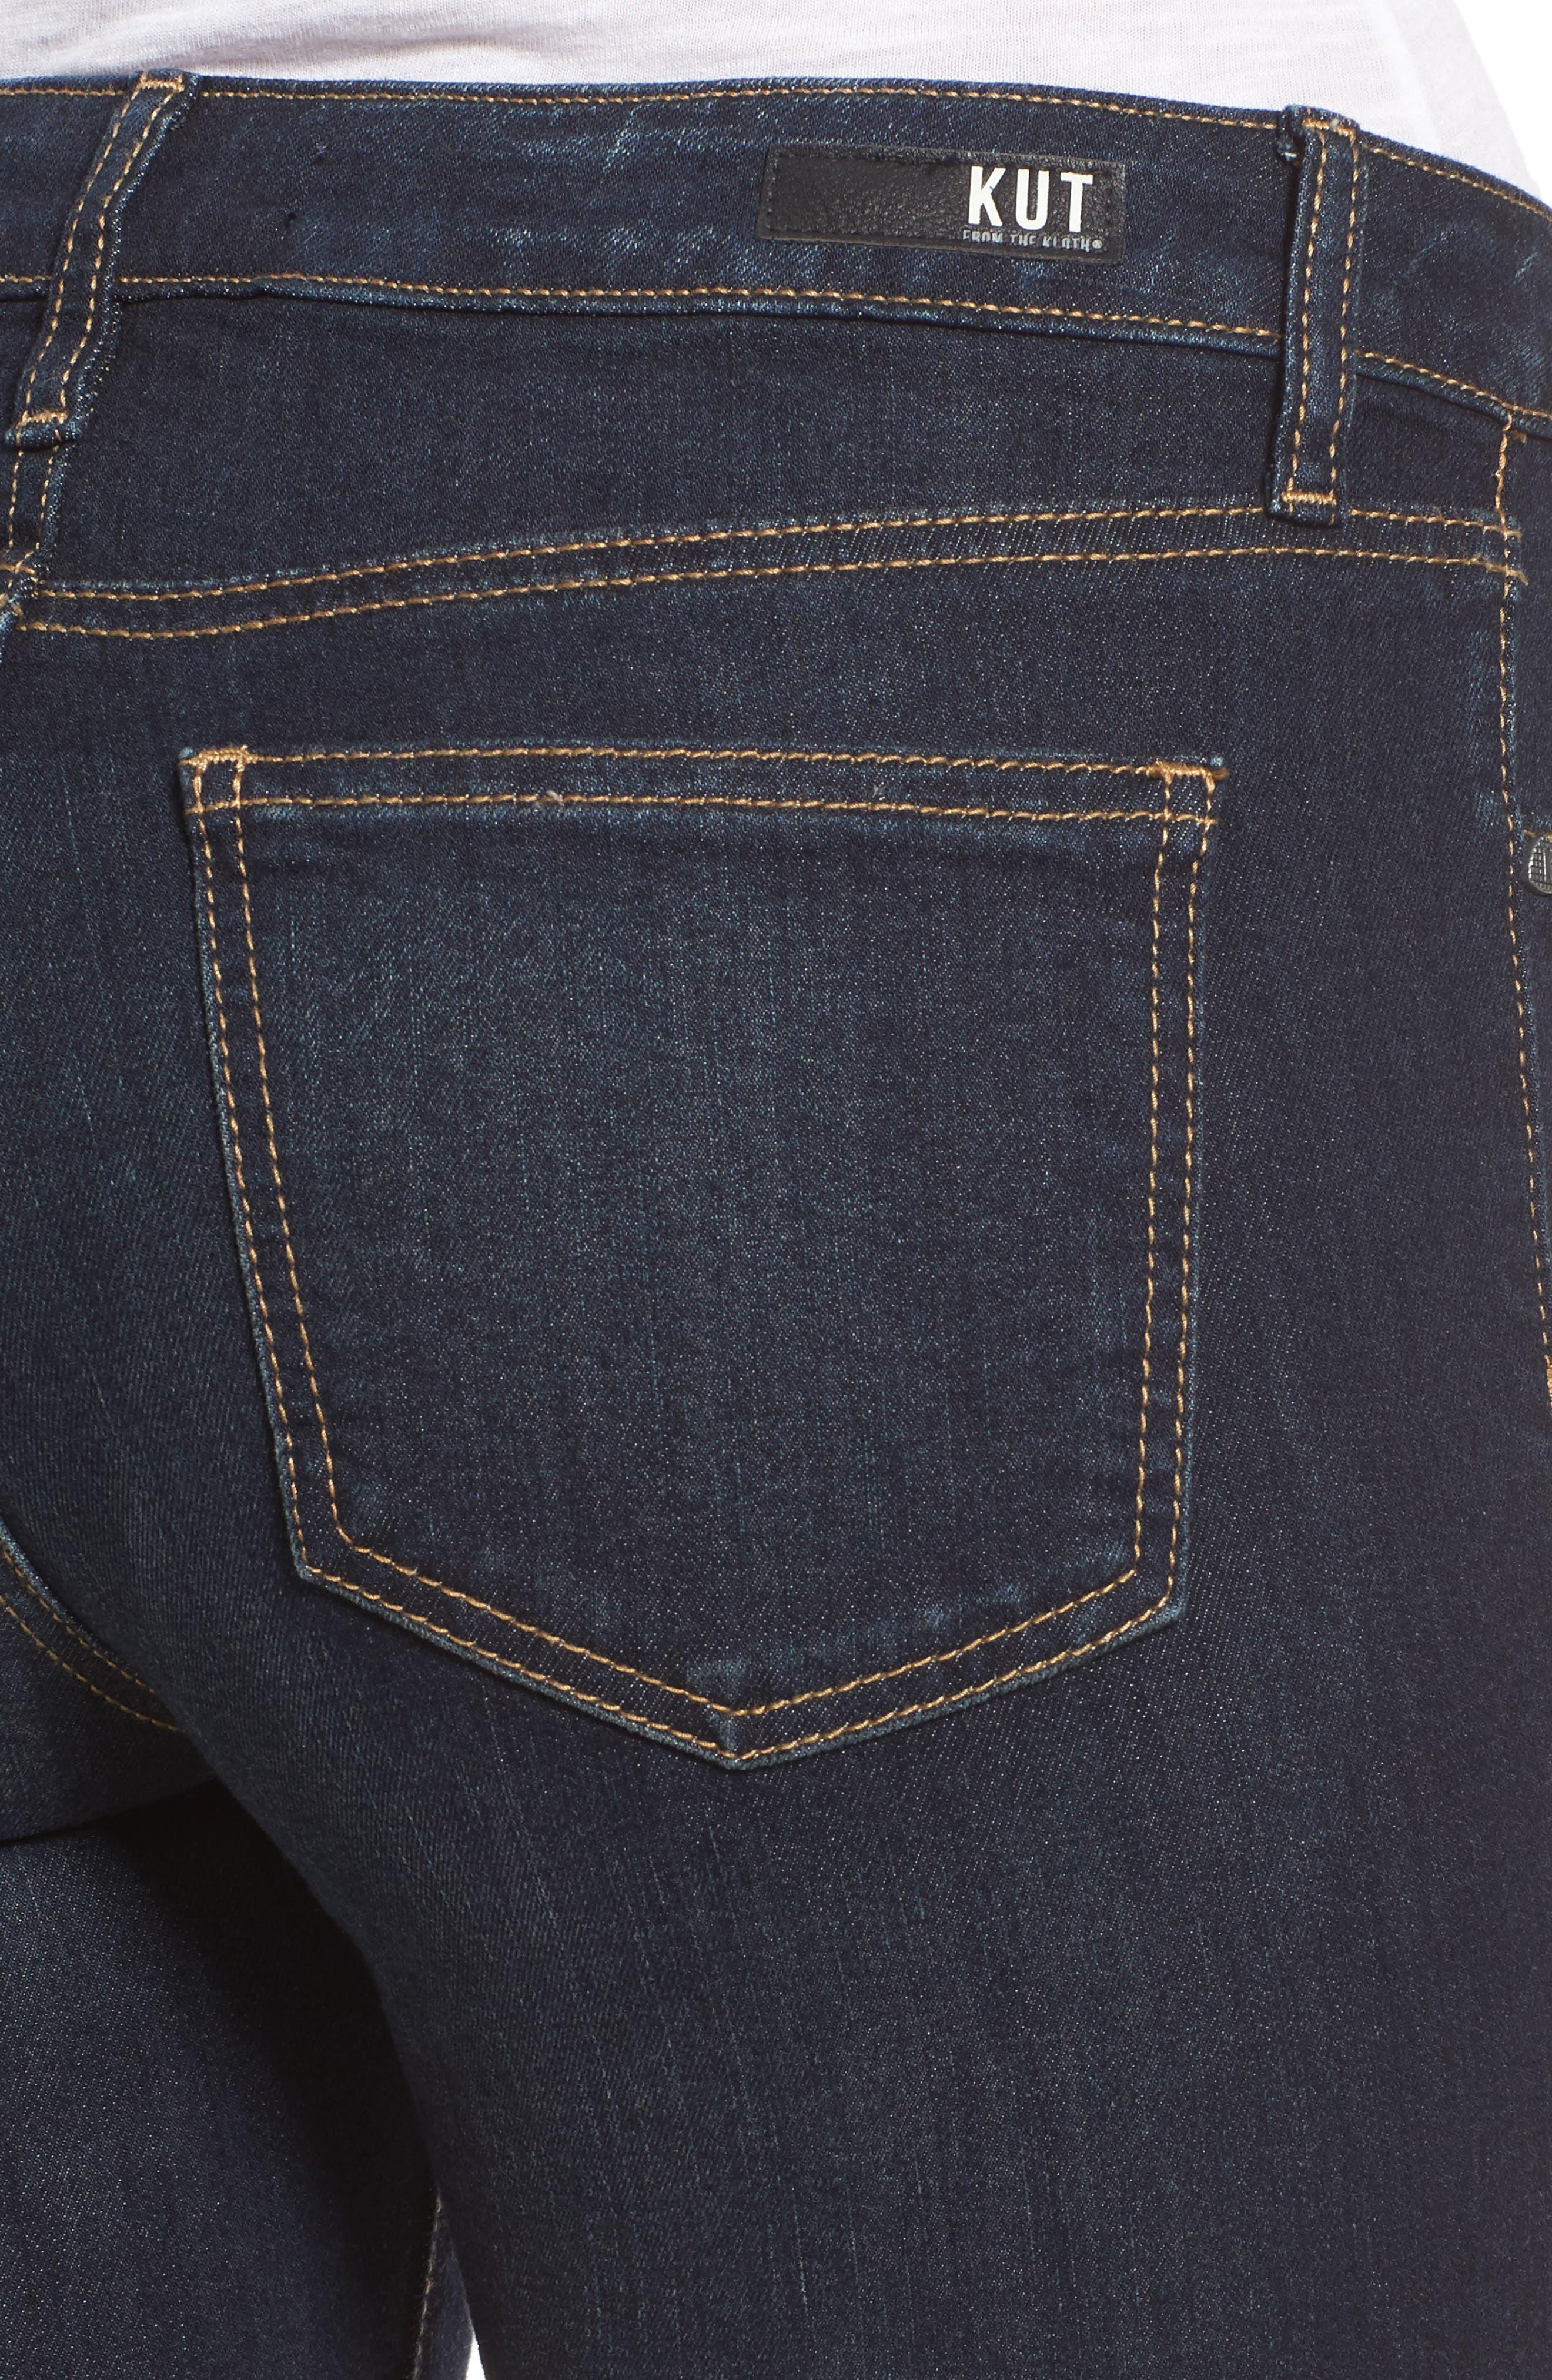 Diana Kurvy Stretch Ankle Jeans,                             Alternate thumbnail 4, color,                             490